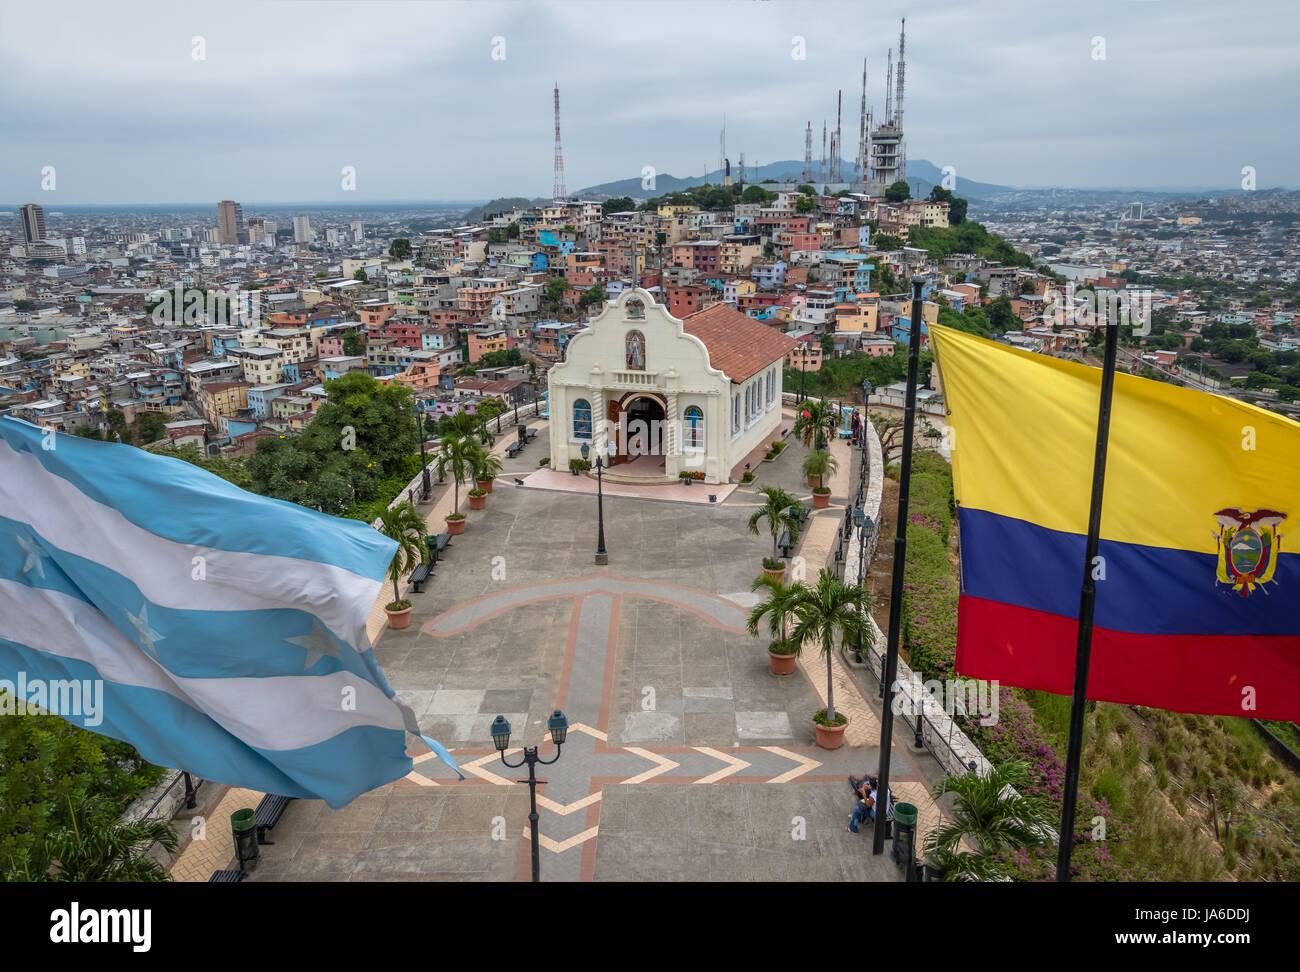 Santa Ana Church on top of Santa Ana hill with Ecuador and city flags - Guayaquil, Ecuador - Stock Image